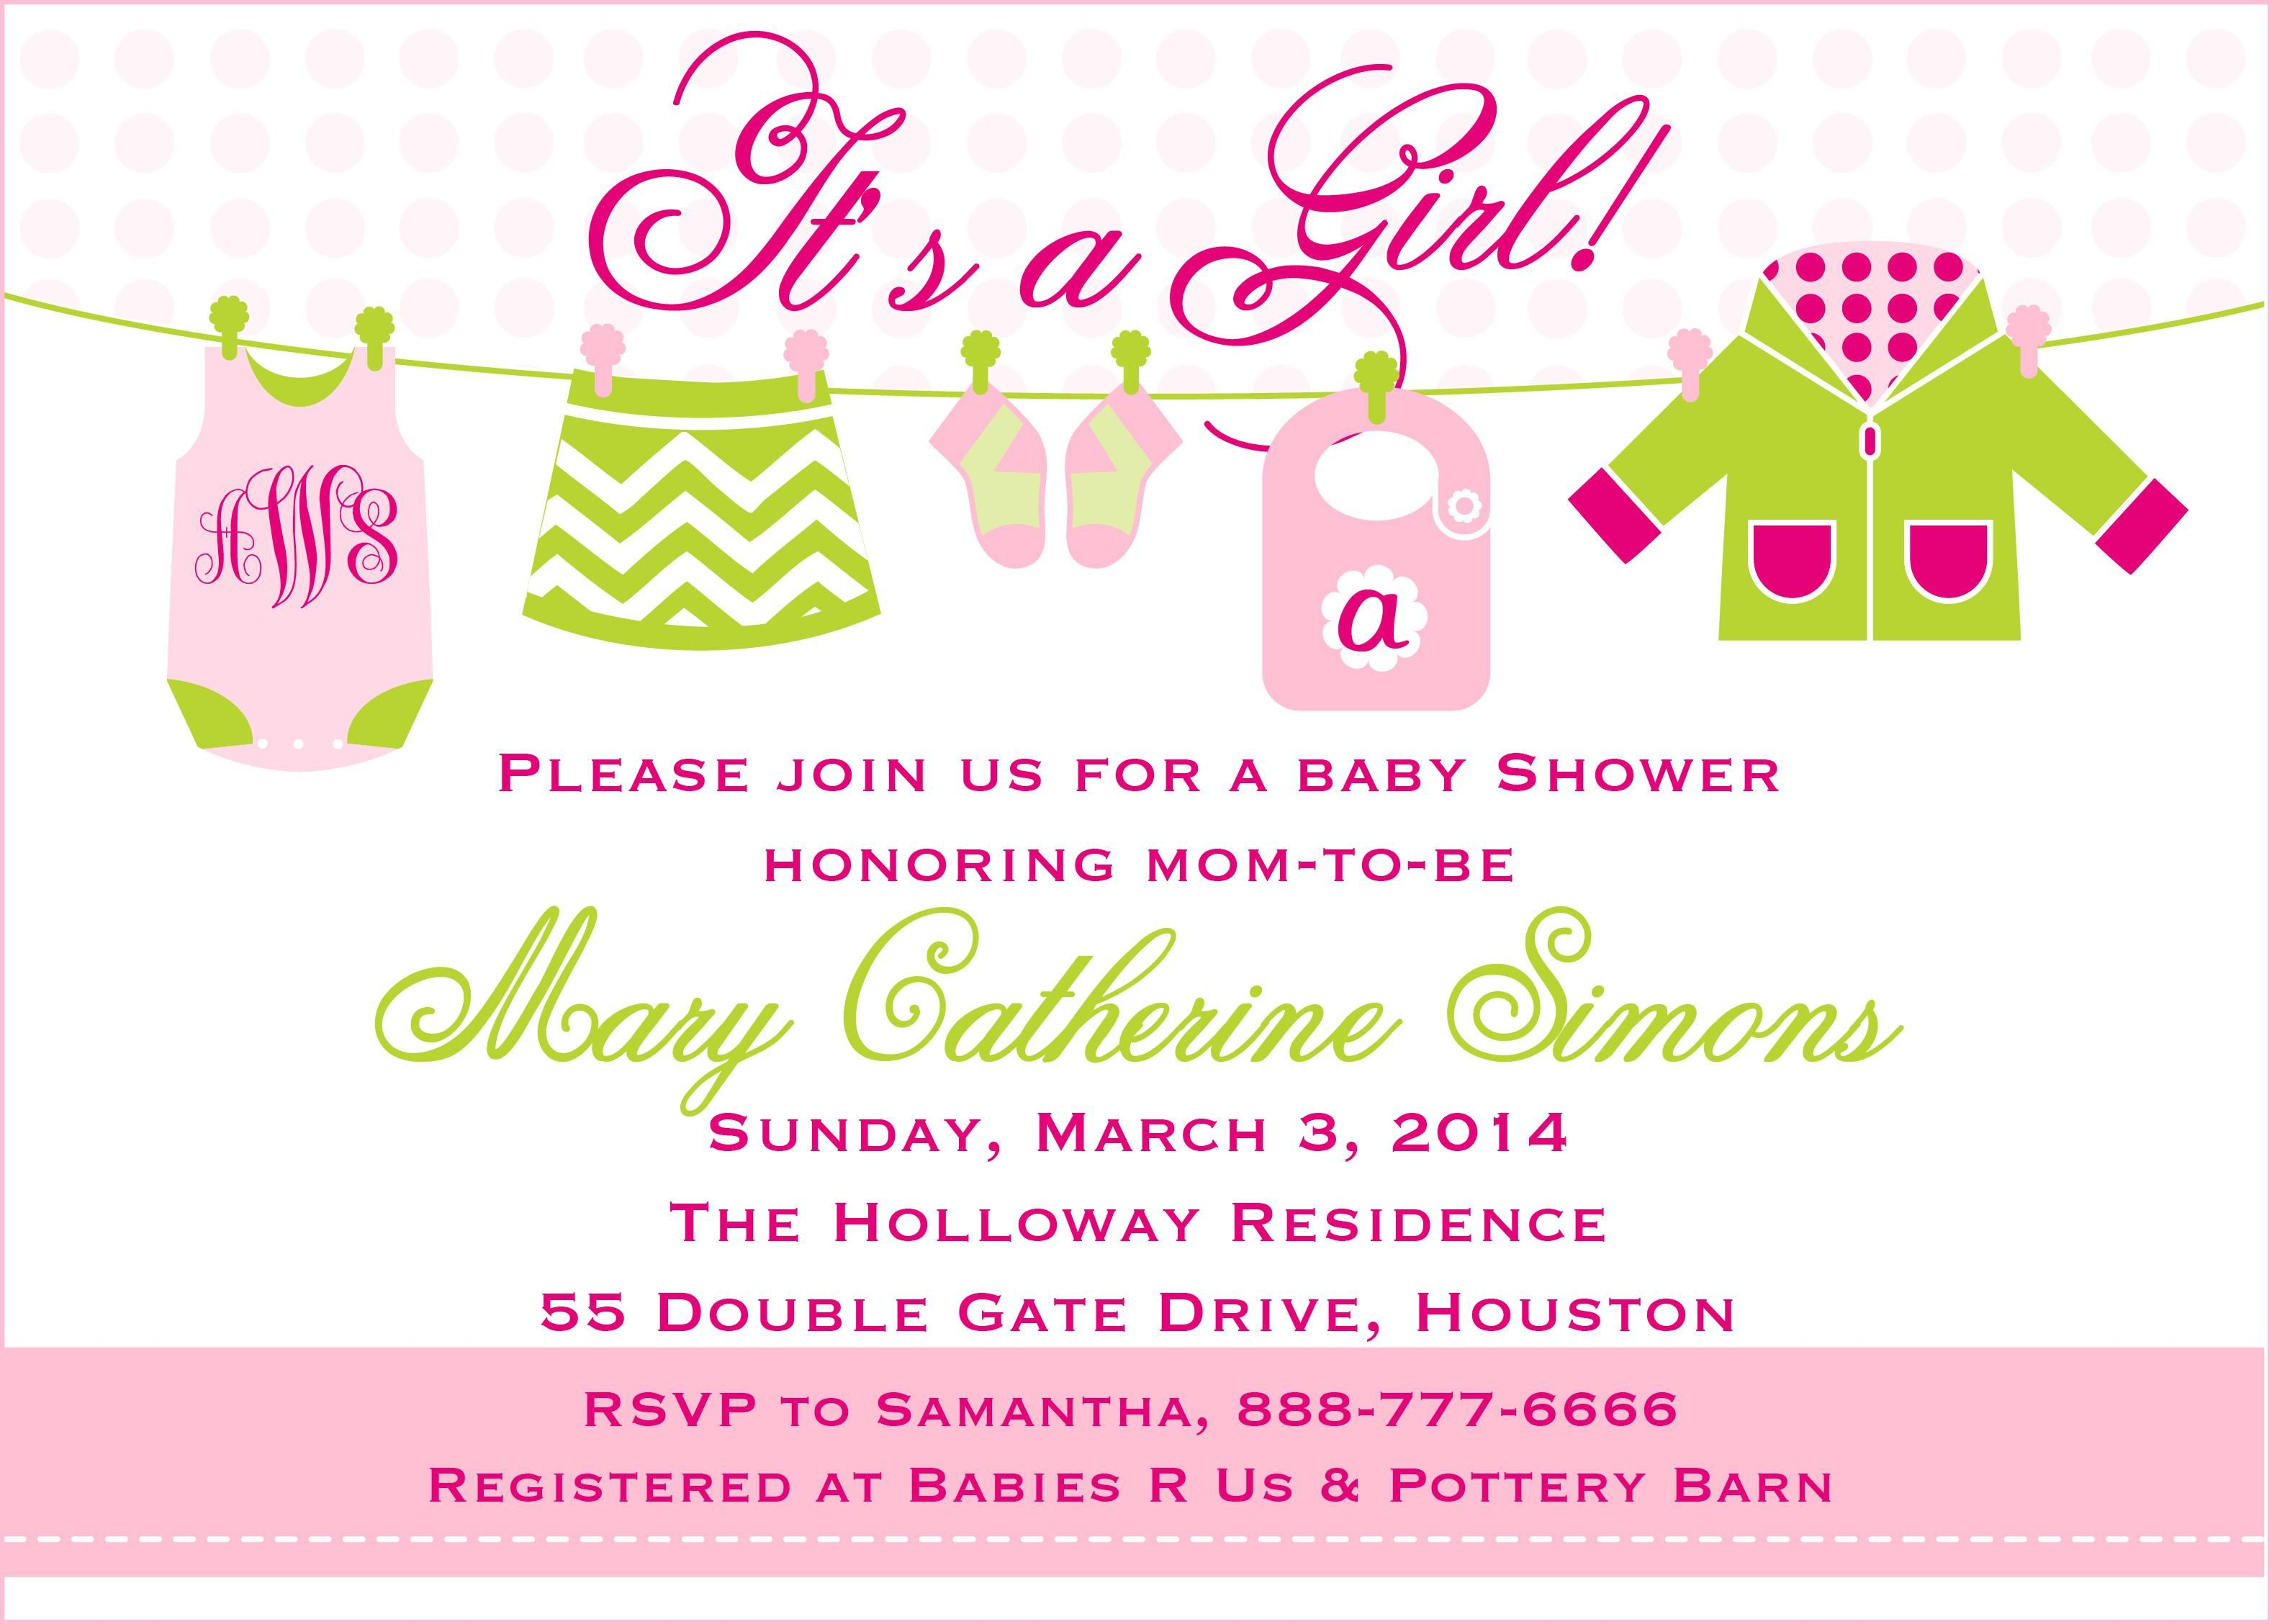 Baby Shower Invitation Card : Baby Shower Invitation Book Instead ...